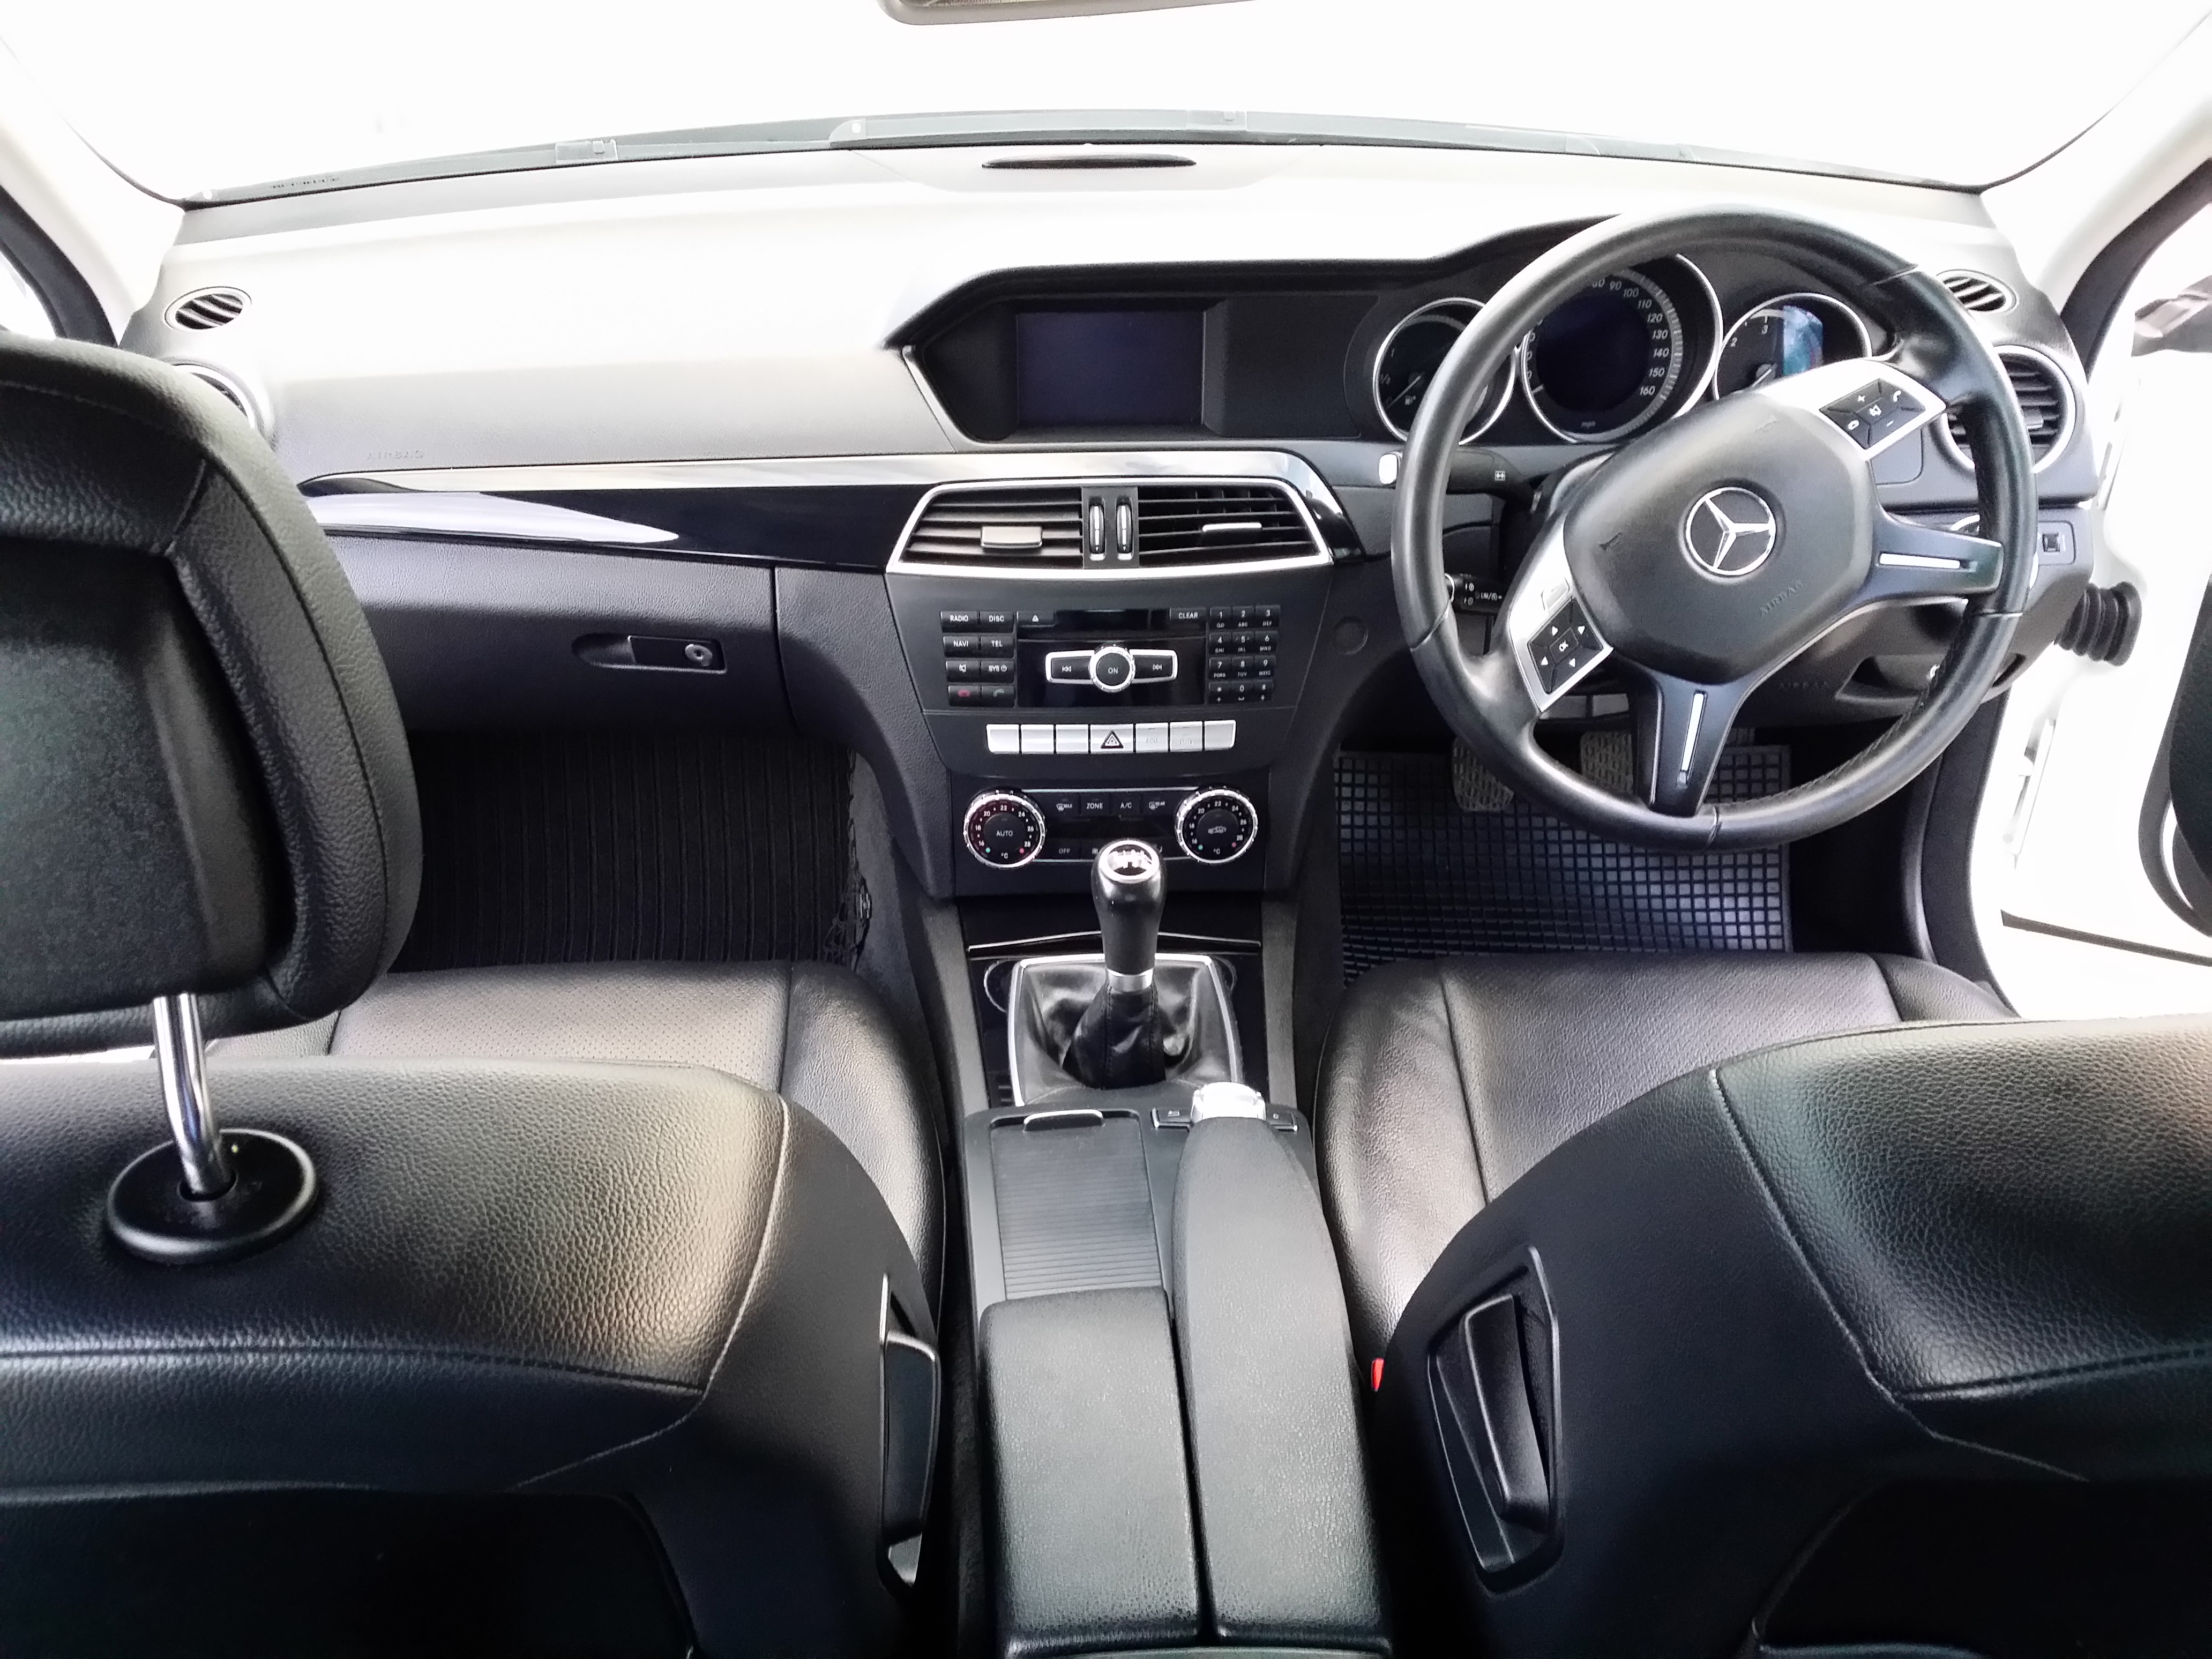 Mercedes C220 CDI 2013 White